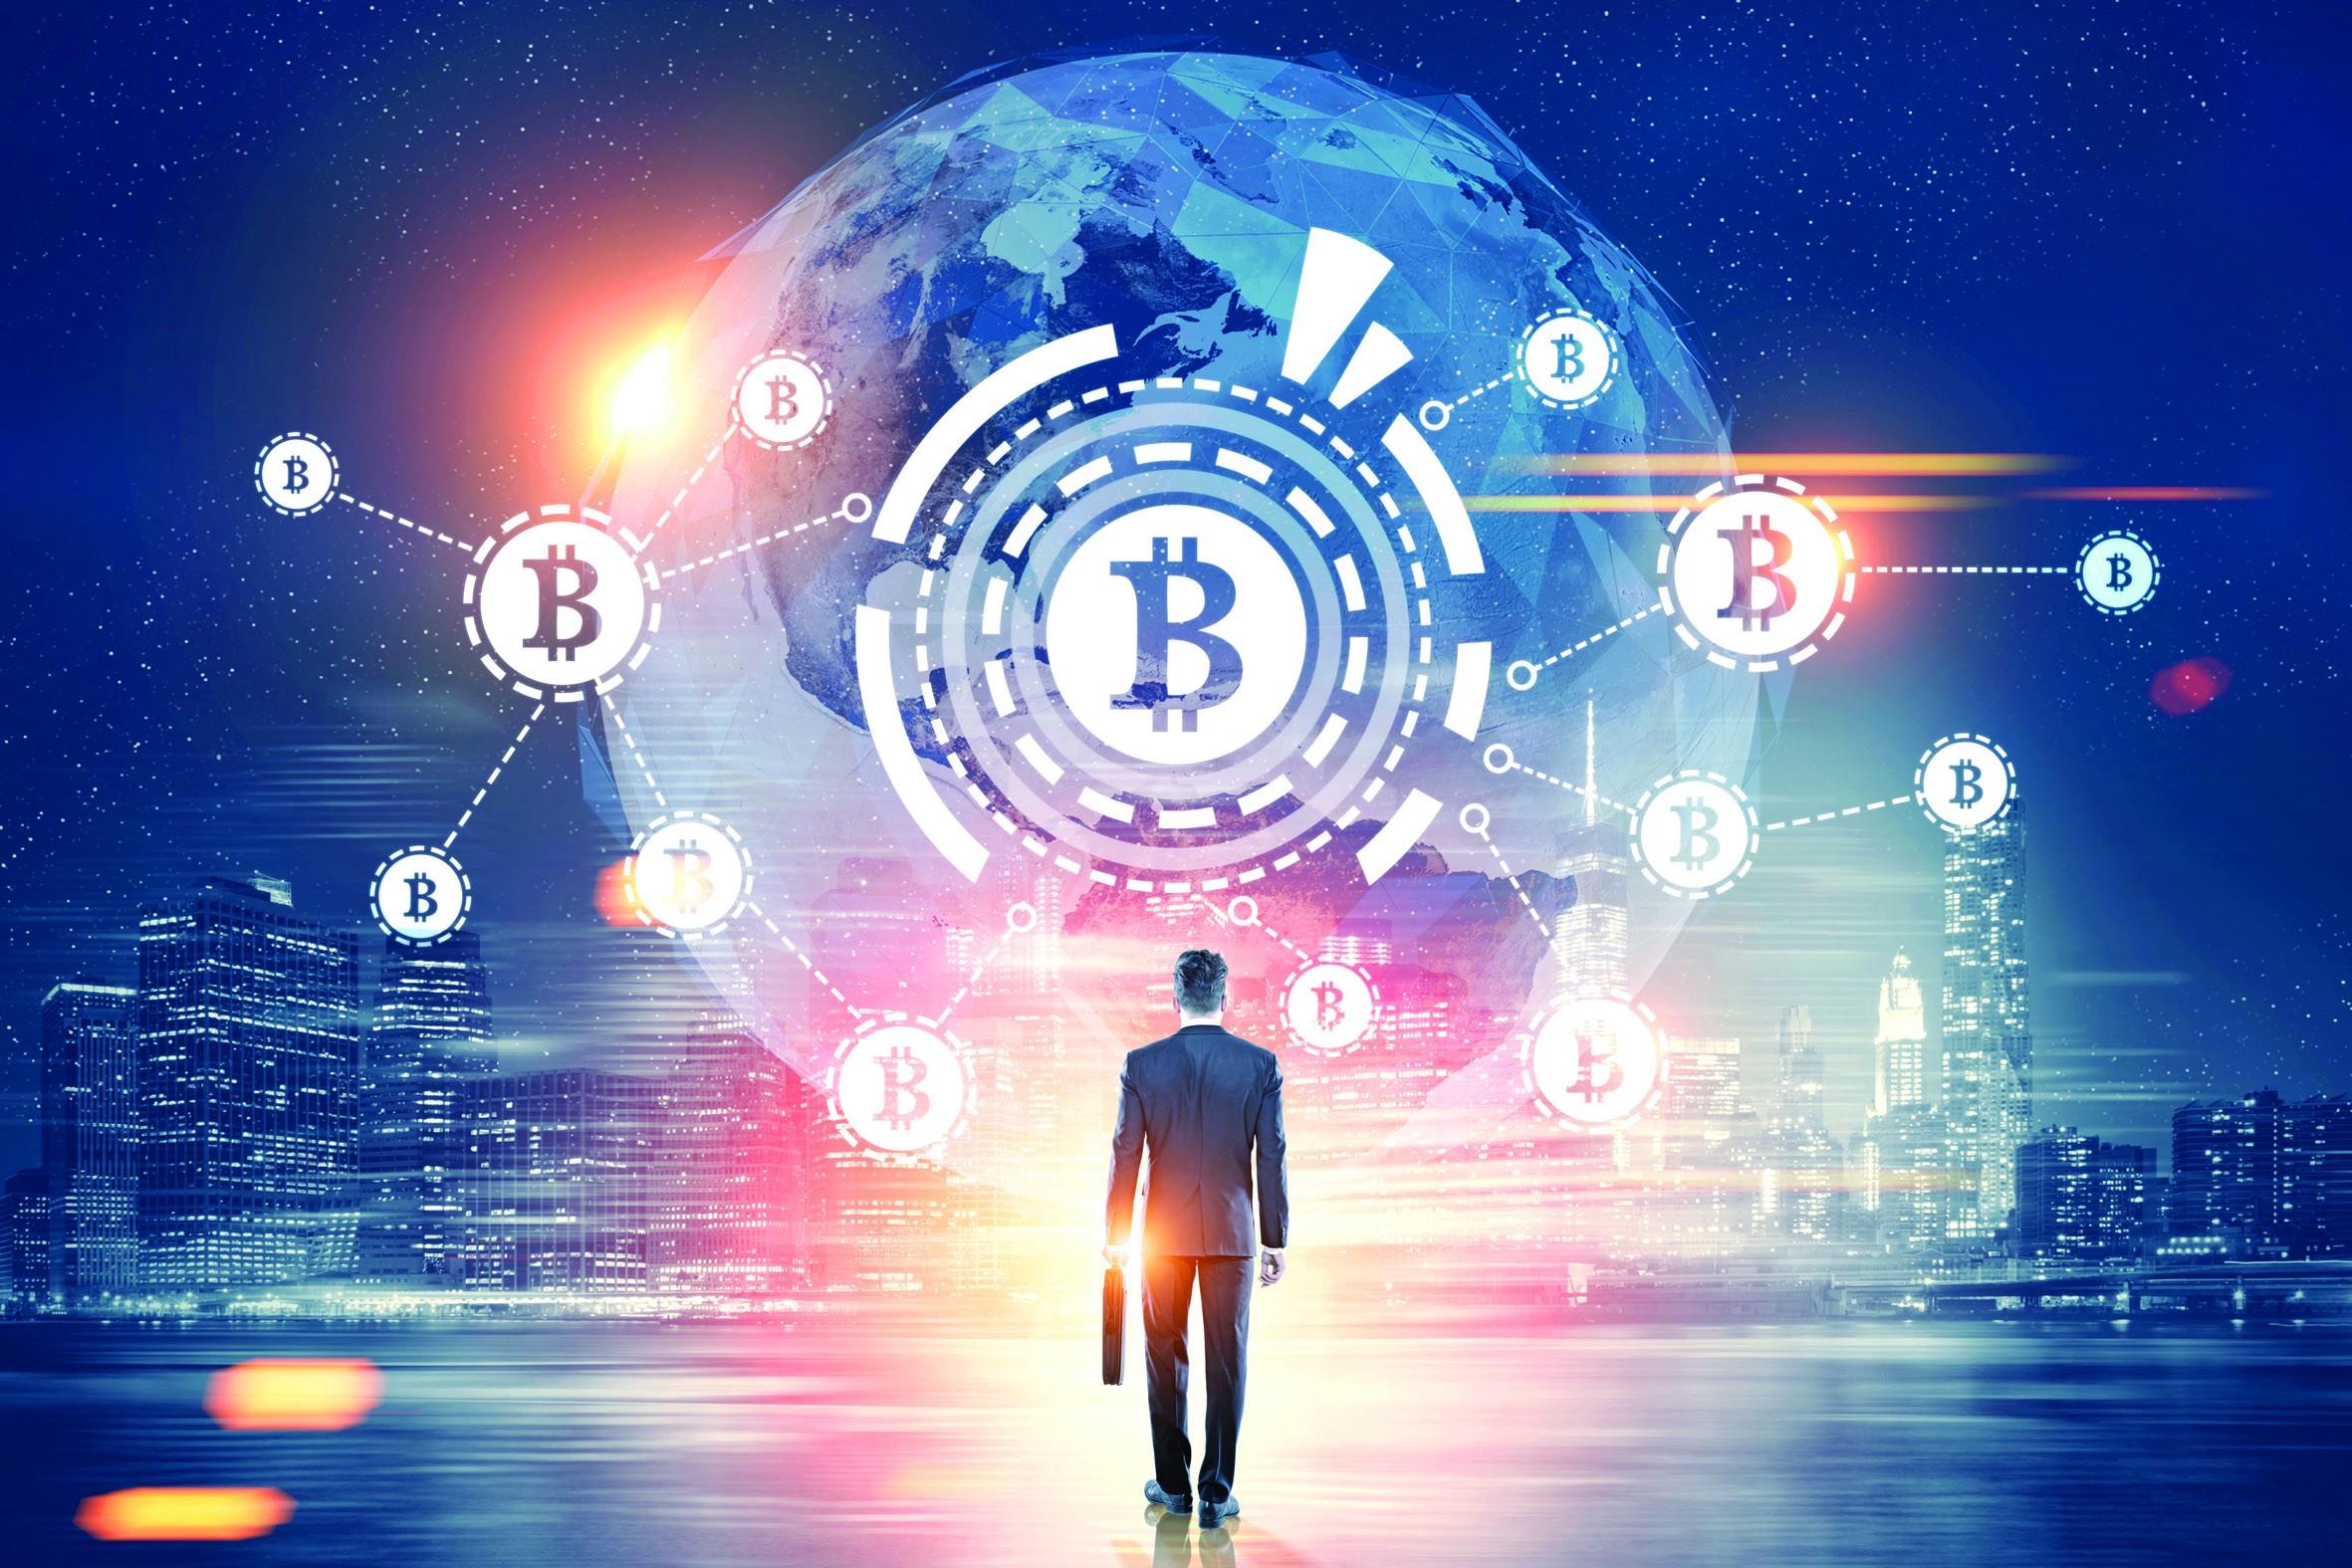 Bitcoin Features that Make it Prestigious